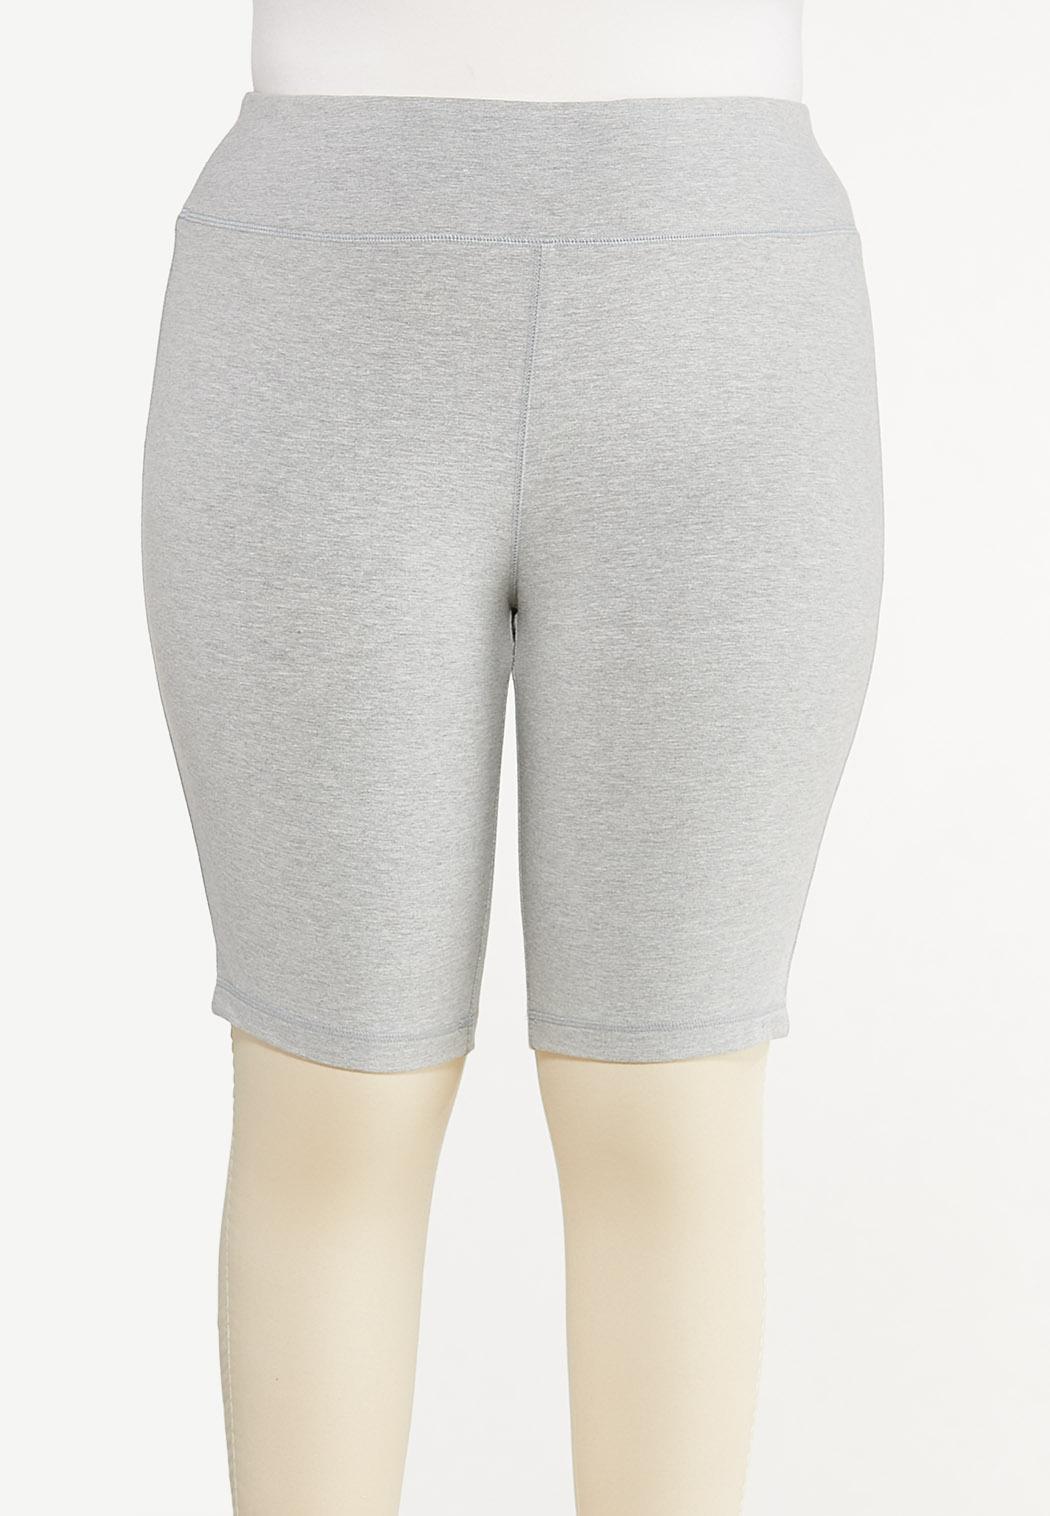 Plus Size Heather Gray Biker Shorts